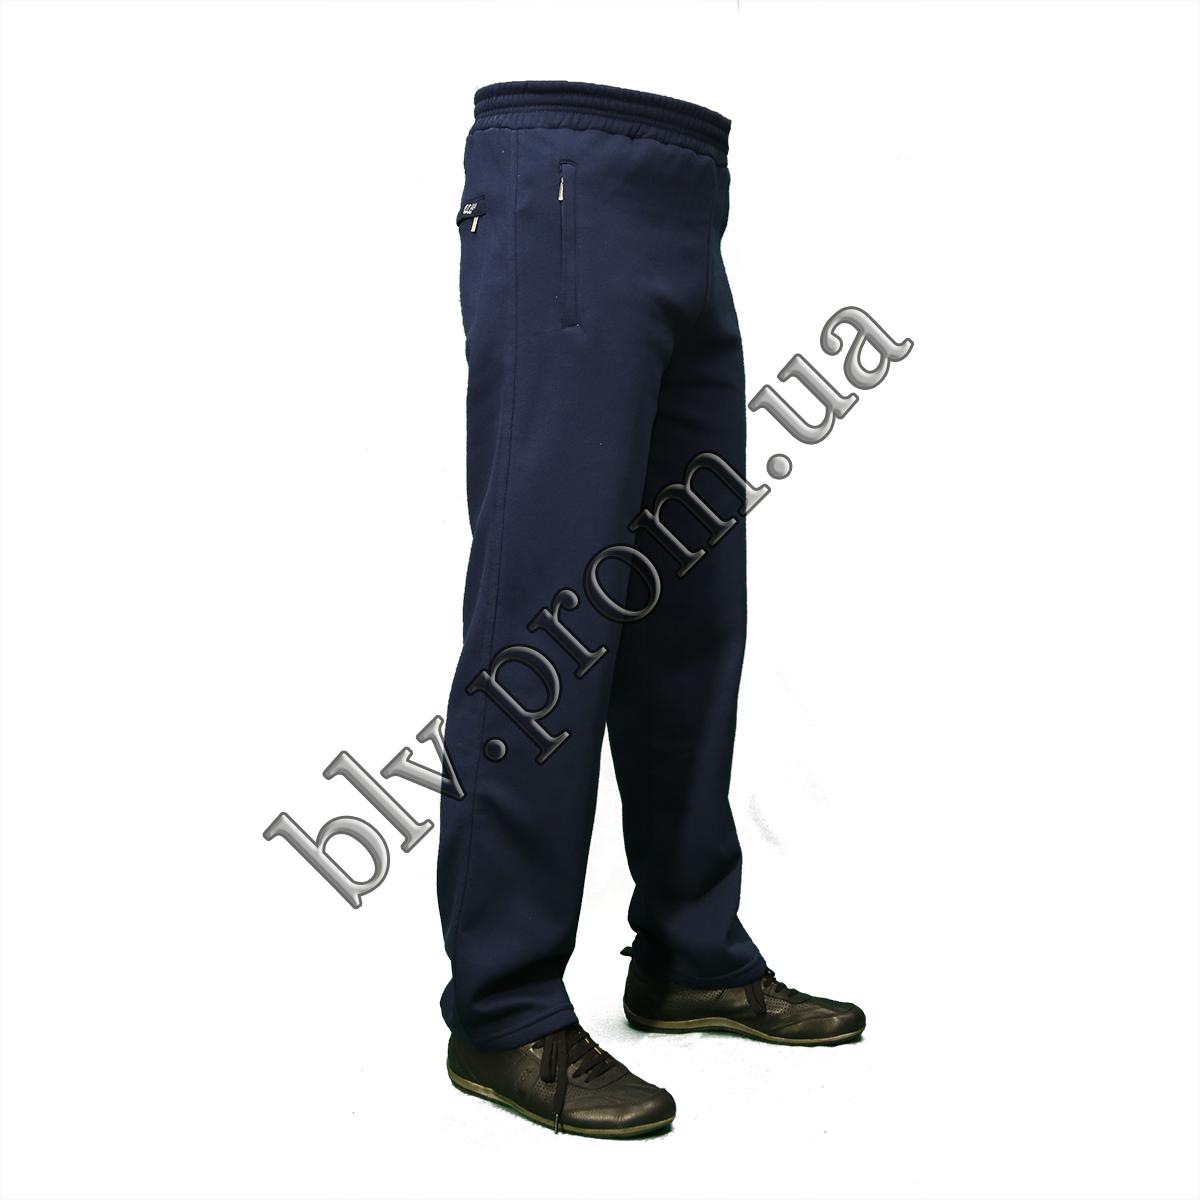 Теплые мужские брюки байка KD314 Indigo